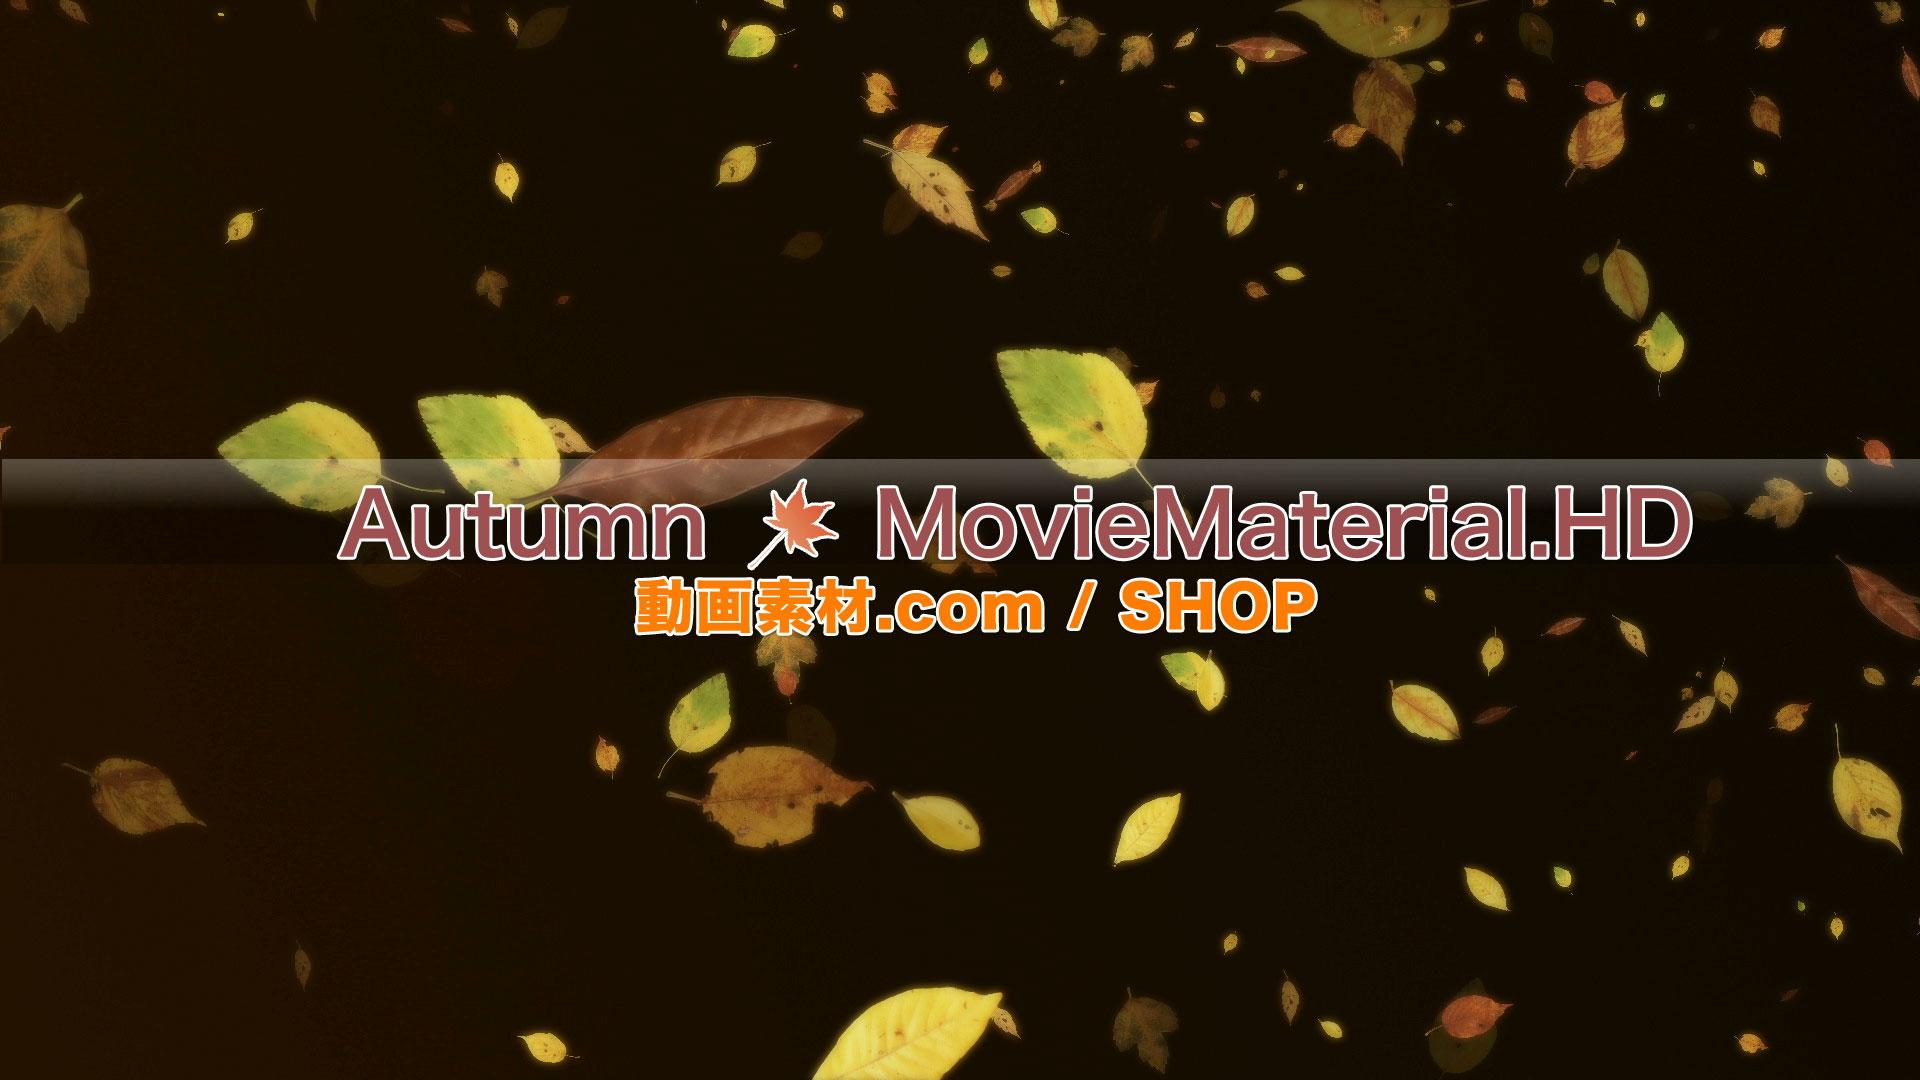 【Autumn MovieMaterial.HD】ハイビジョン 秋を題材にした実写映像素材とCG動画素材_image4